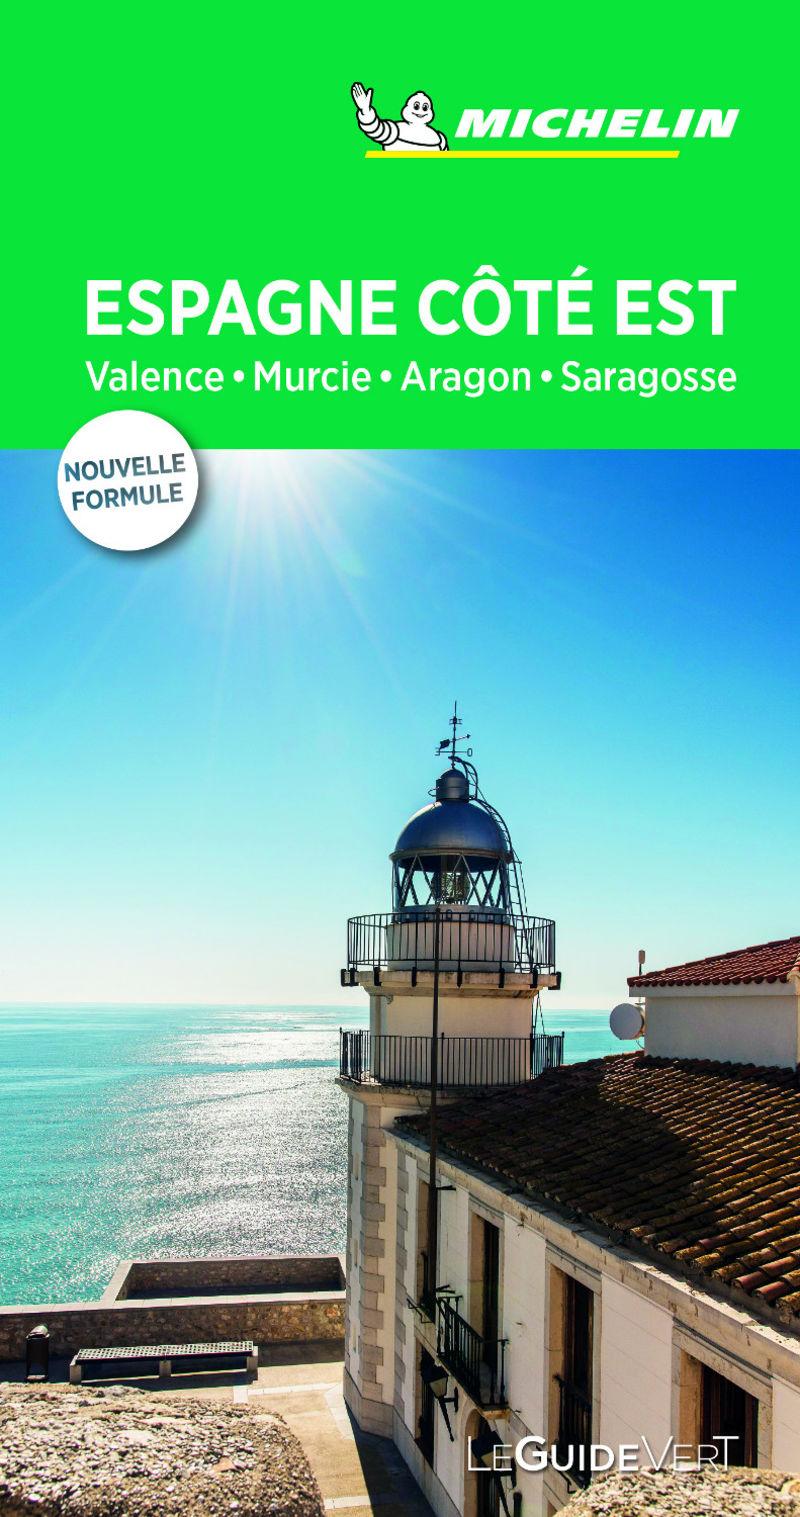 GUIA VERDE ESPAGNE COTE EST : VALENCE, COSTA BLANCA, BALEARES, ARAGON (00525)